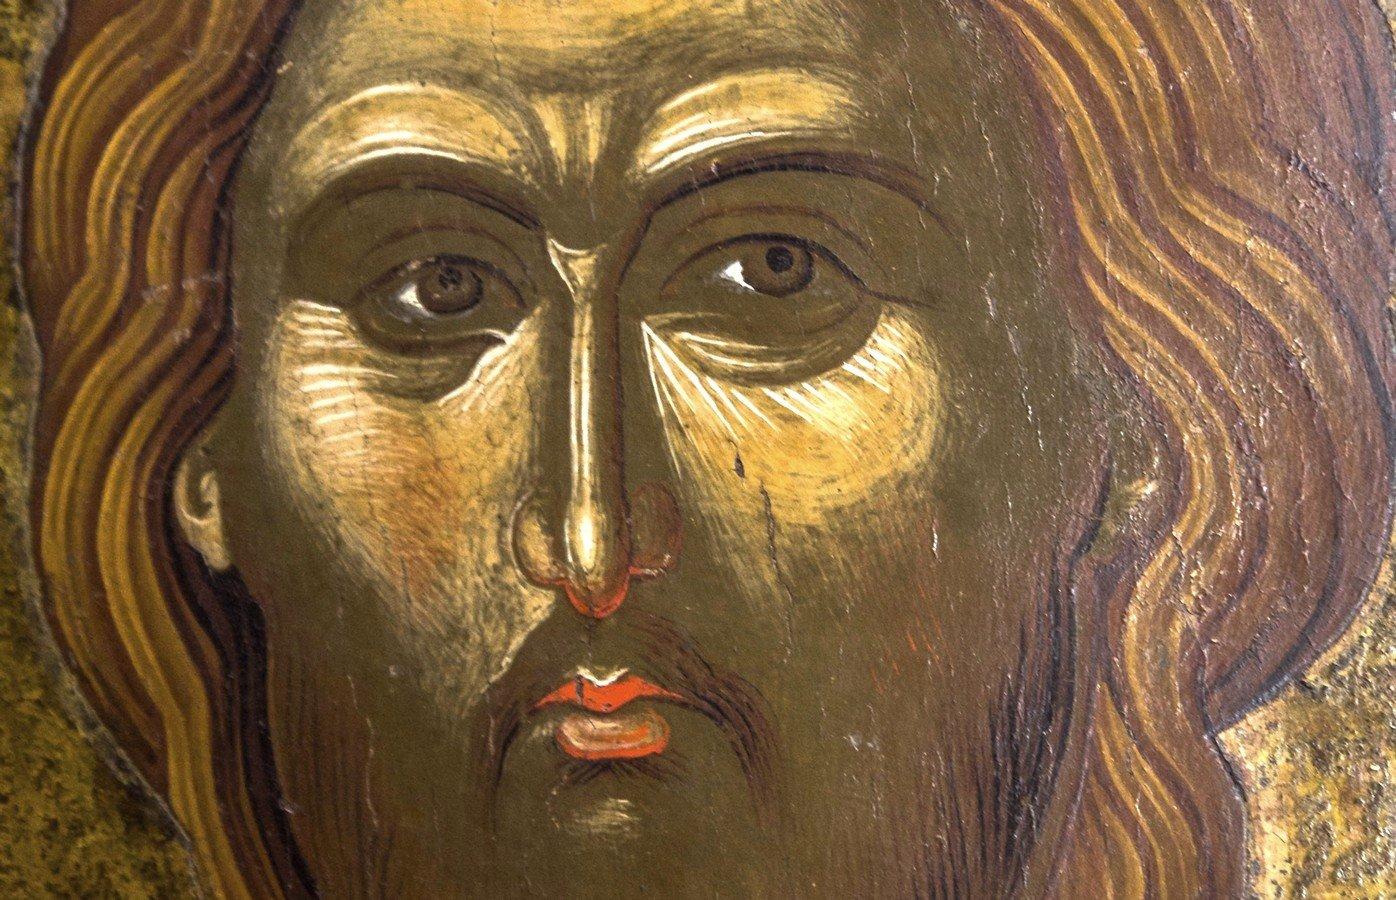 Христос Пантократор. Икона. Византия, вторая половина XIV века. Византийский музей в Кастории, Греция. Фрагмент.